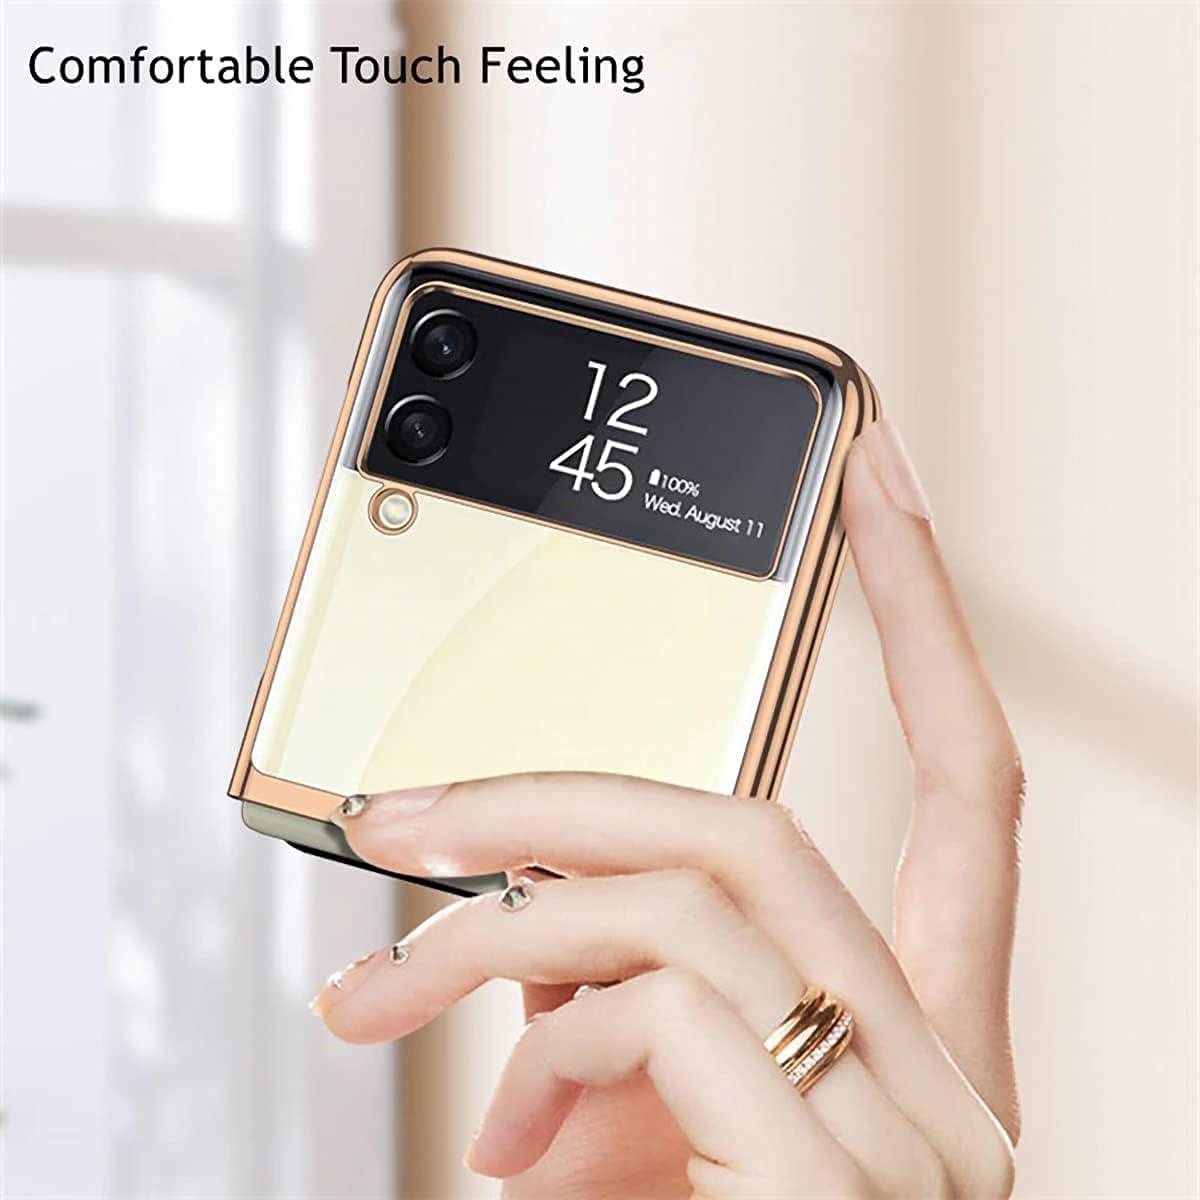 Apply to Z Flip 3 Case, Galaxy Z Flip 3 Case, Samsung Z Flip 3 Case, Clear Crystal Transparent Plating Case, Slim Case Designed, Ultra-Thin Fiber Leather Shockproof Protective Case (Clear-Gold)